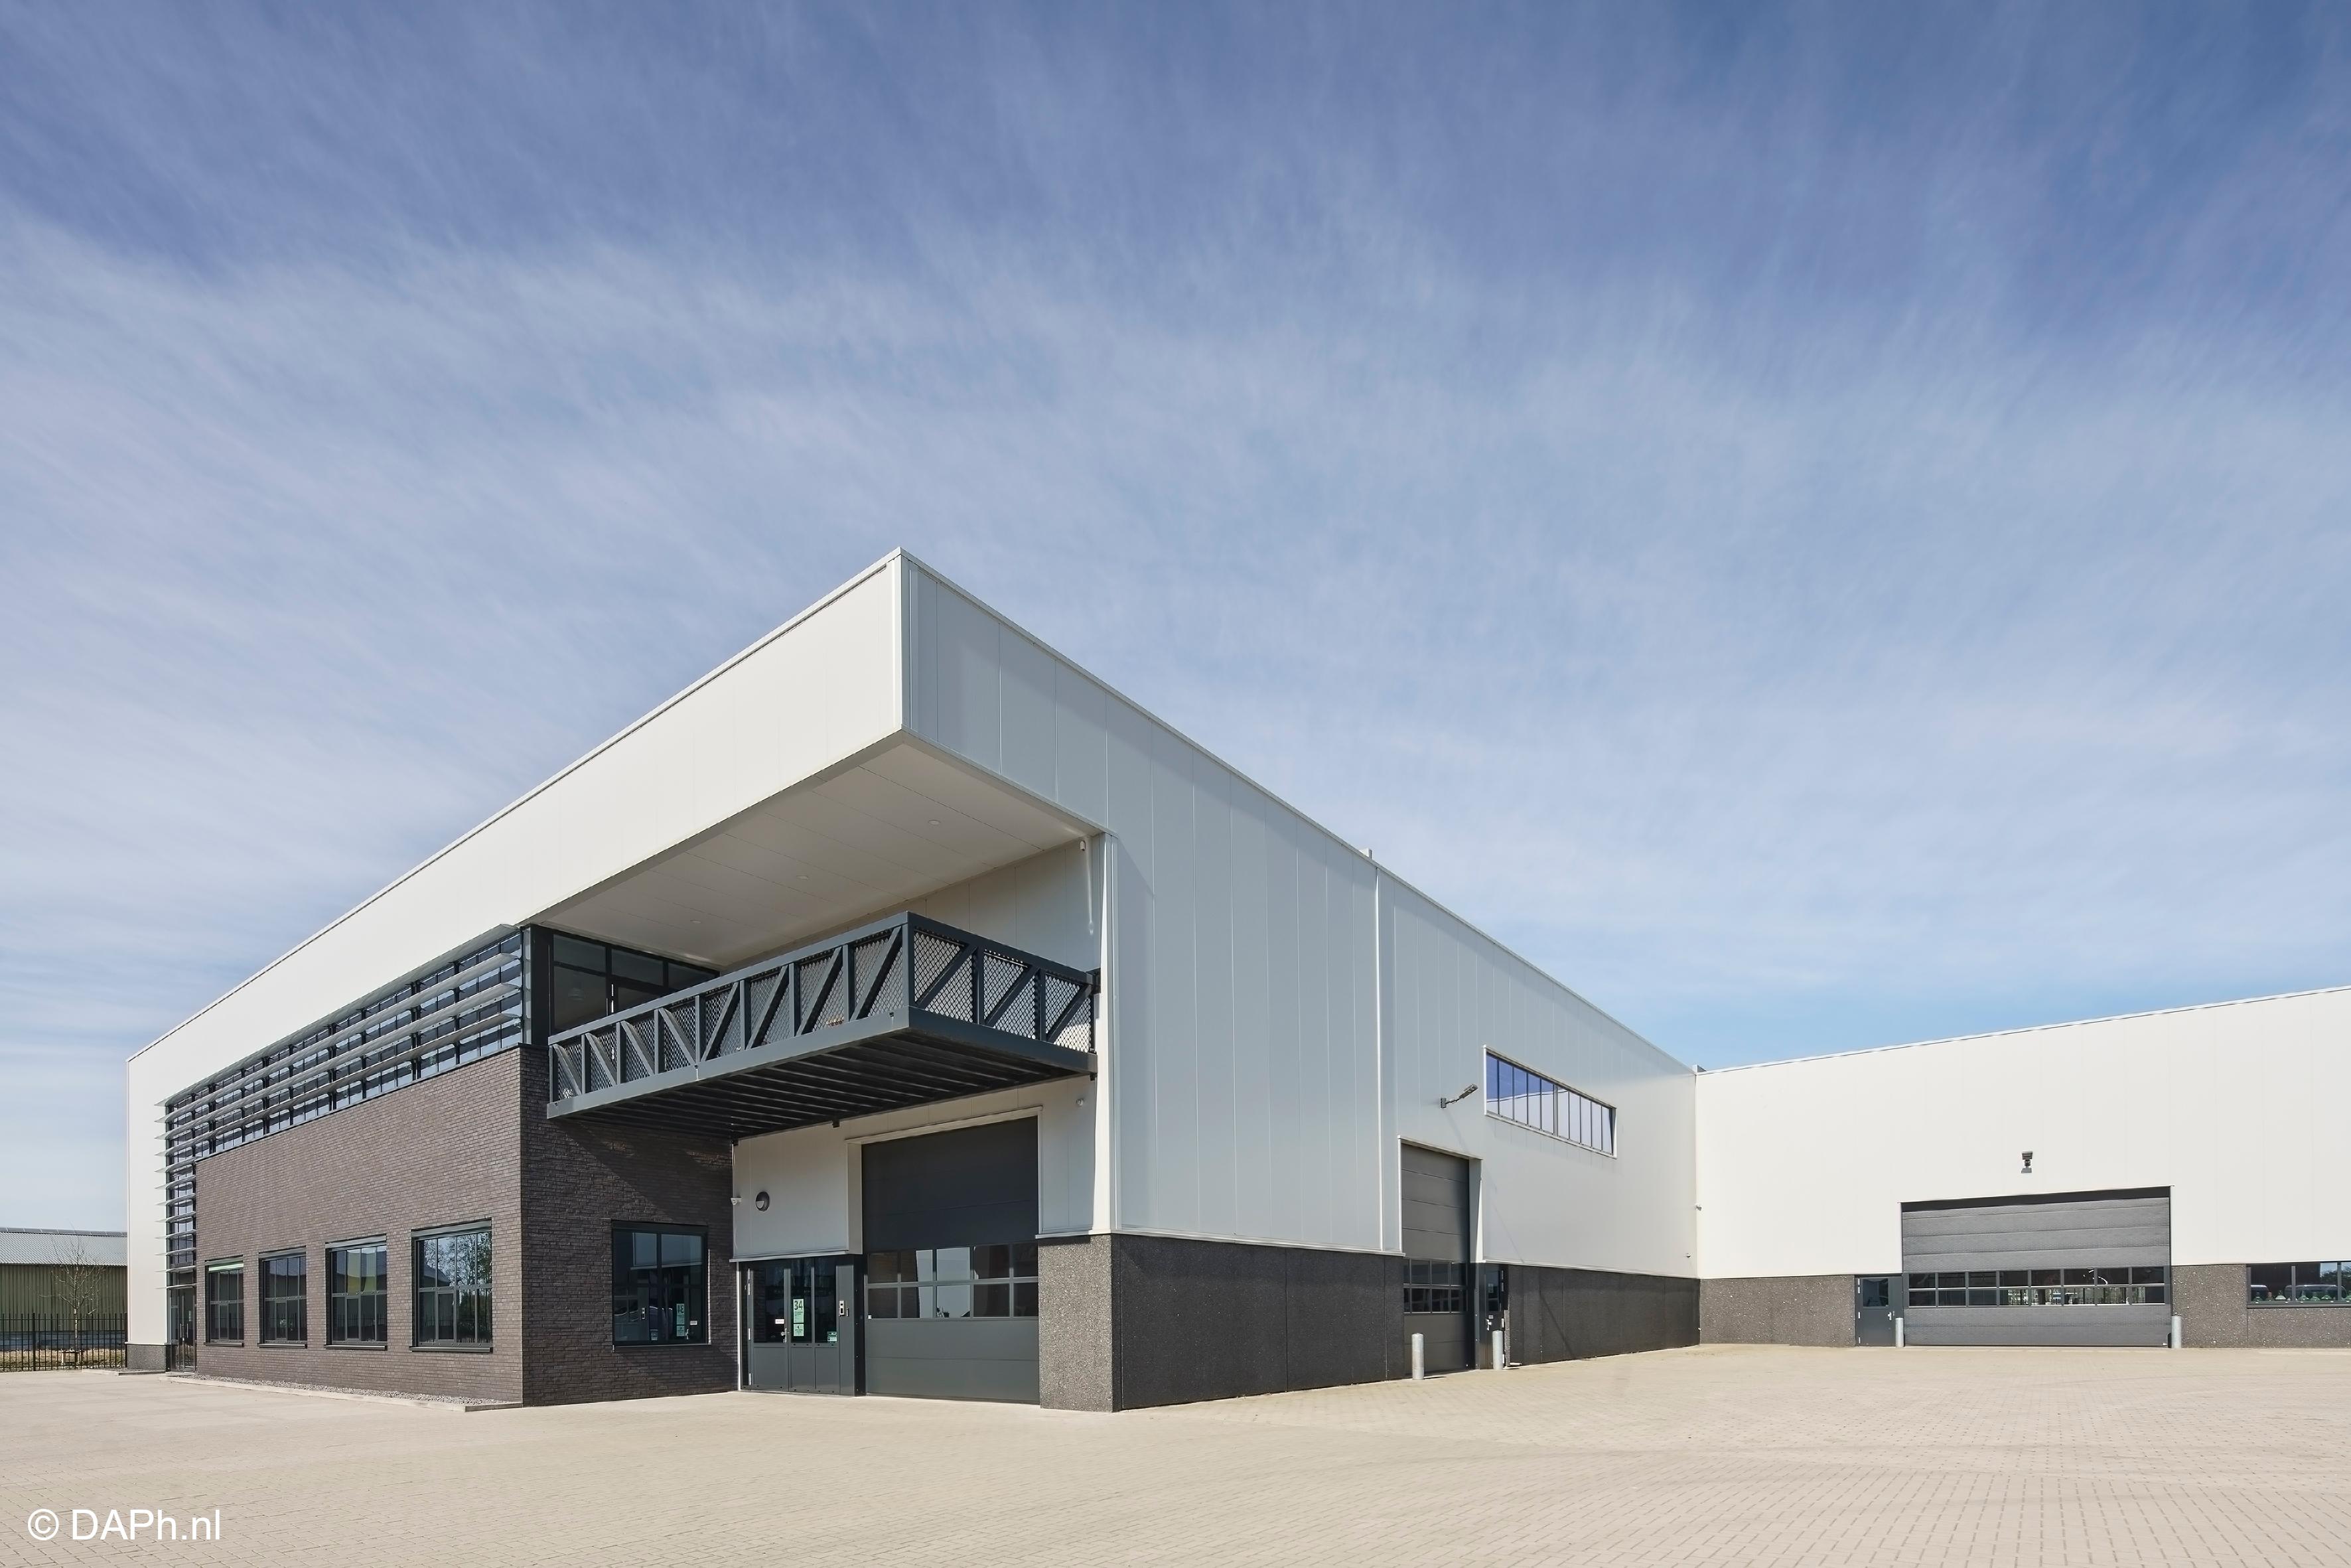 SIEMENS ARENA Universal Arena